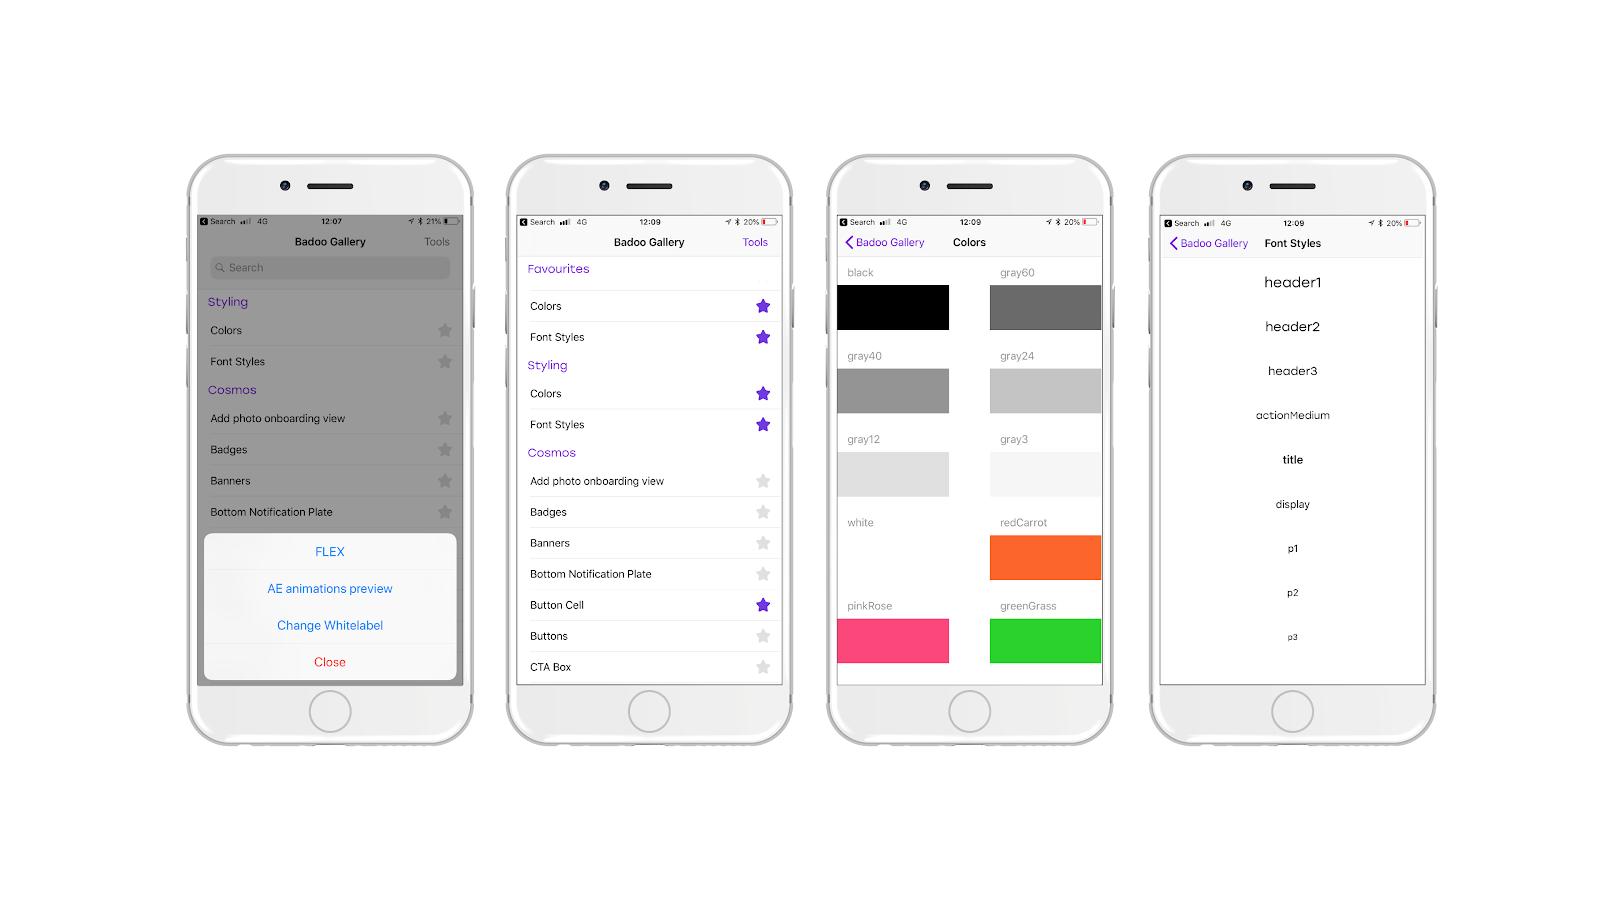 Реализуем UI в iOS: улучшаем, ускоряем, масштабируем - 9